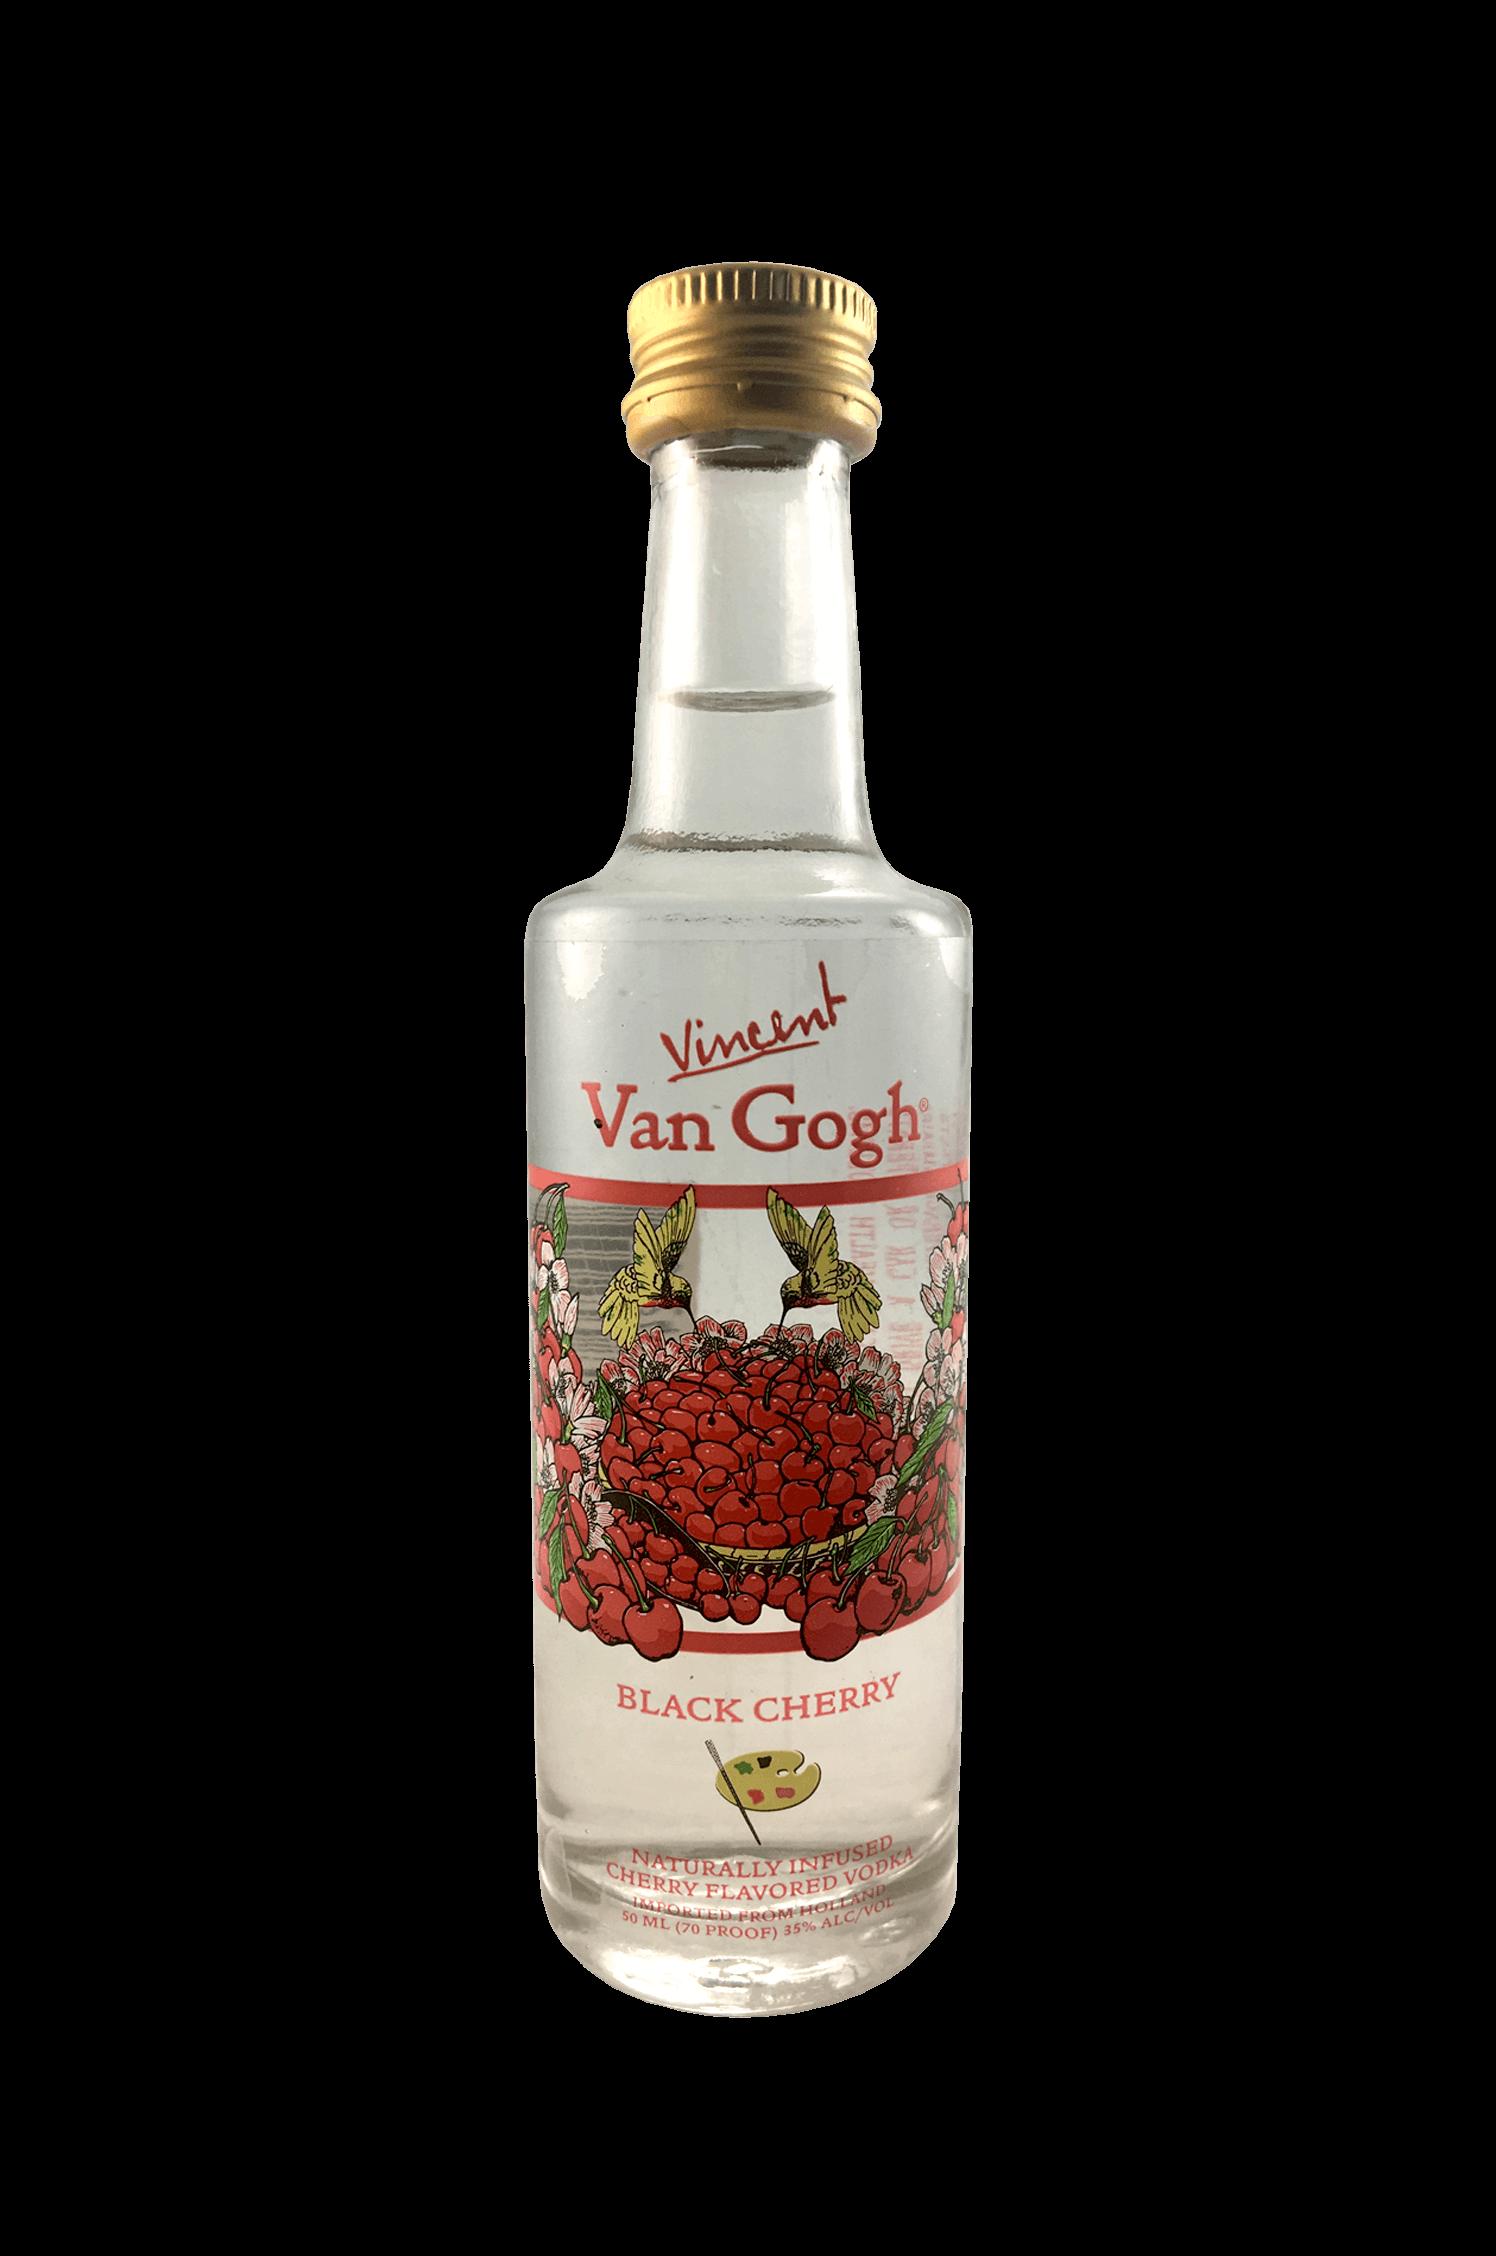 Van Gogh – Black Cherry